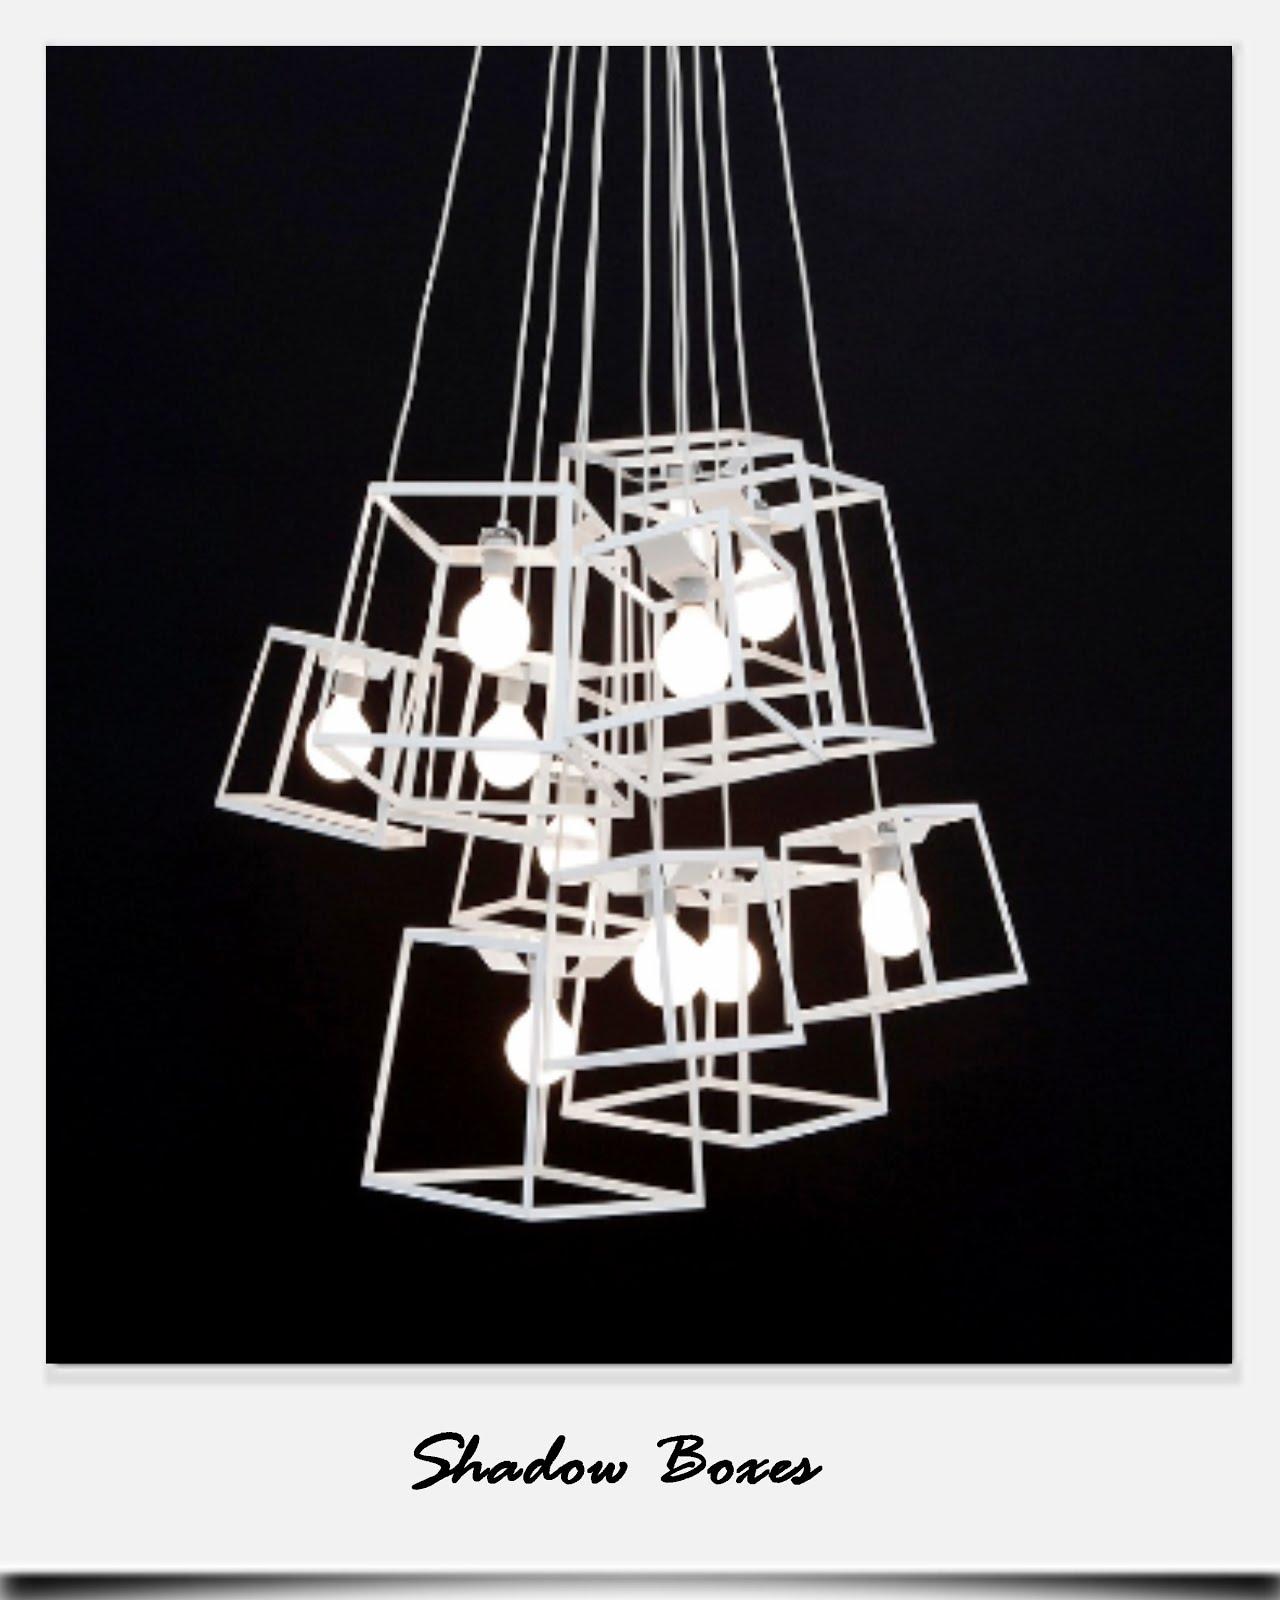 Interesting Light Fixtures: In·sa·tia·ble-de·sign: Cool Light Fixtures